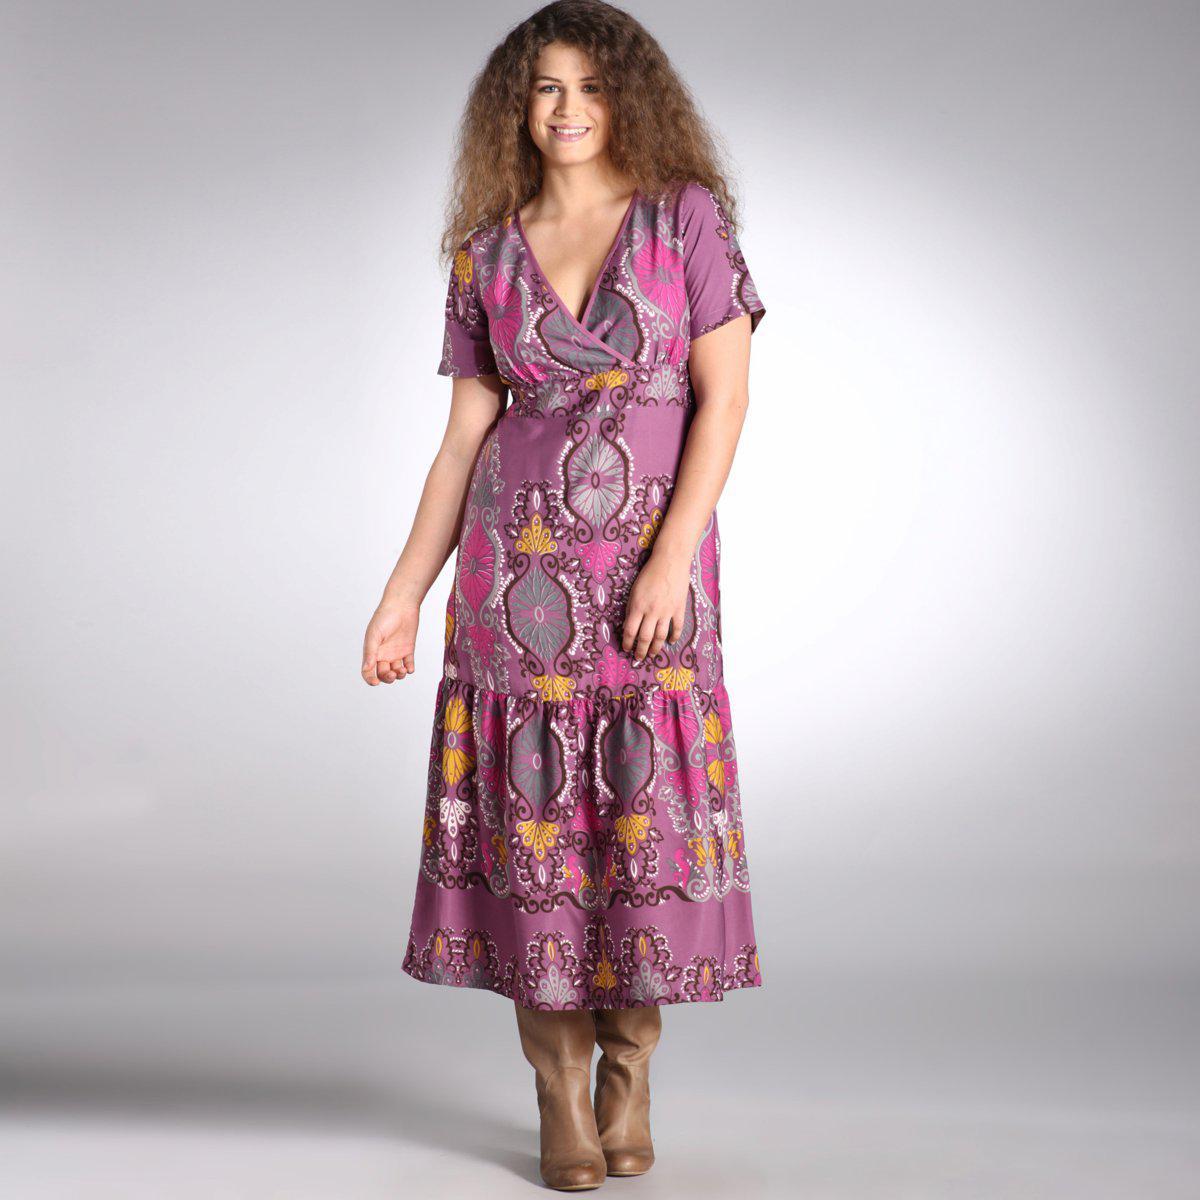 bradyna foremata 286 - Βραδυνα Φορεματα LaRedoute Χειμώνας 2012 Κωδ. 324210257